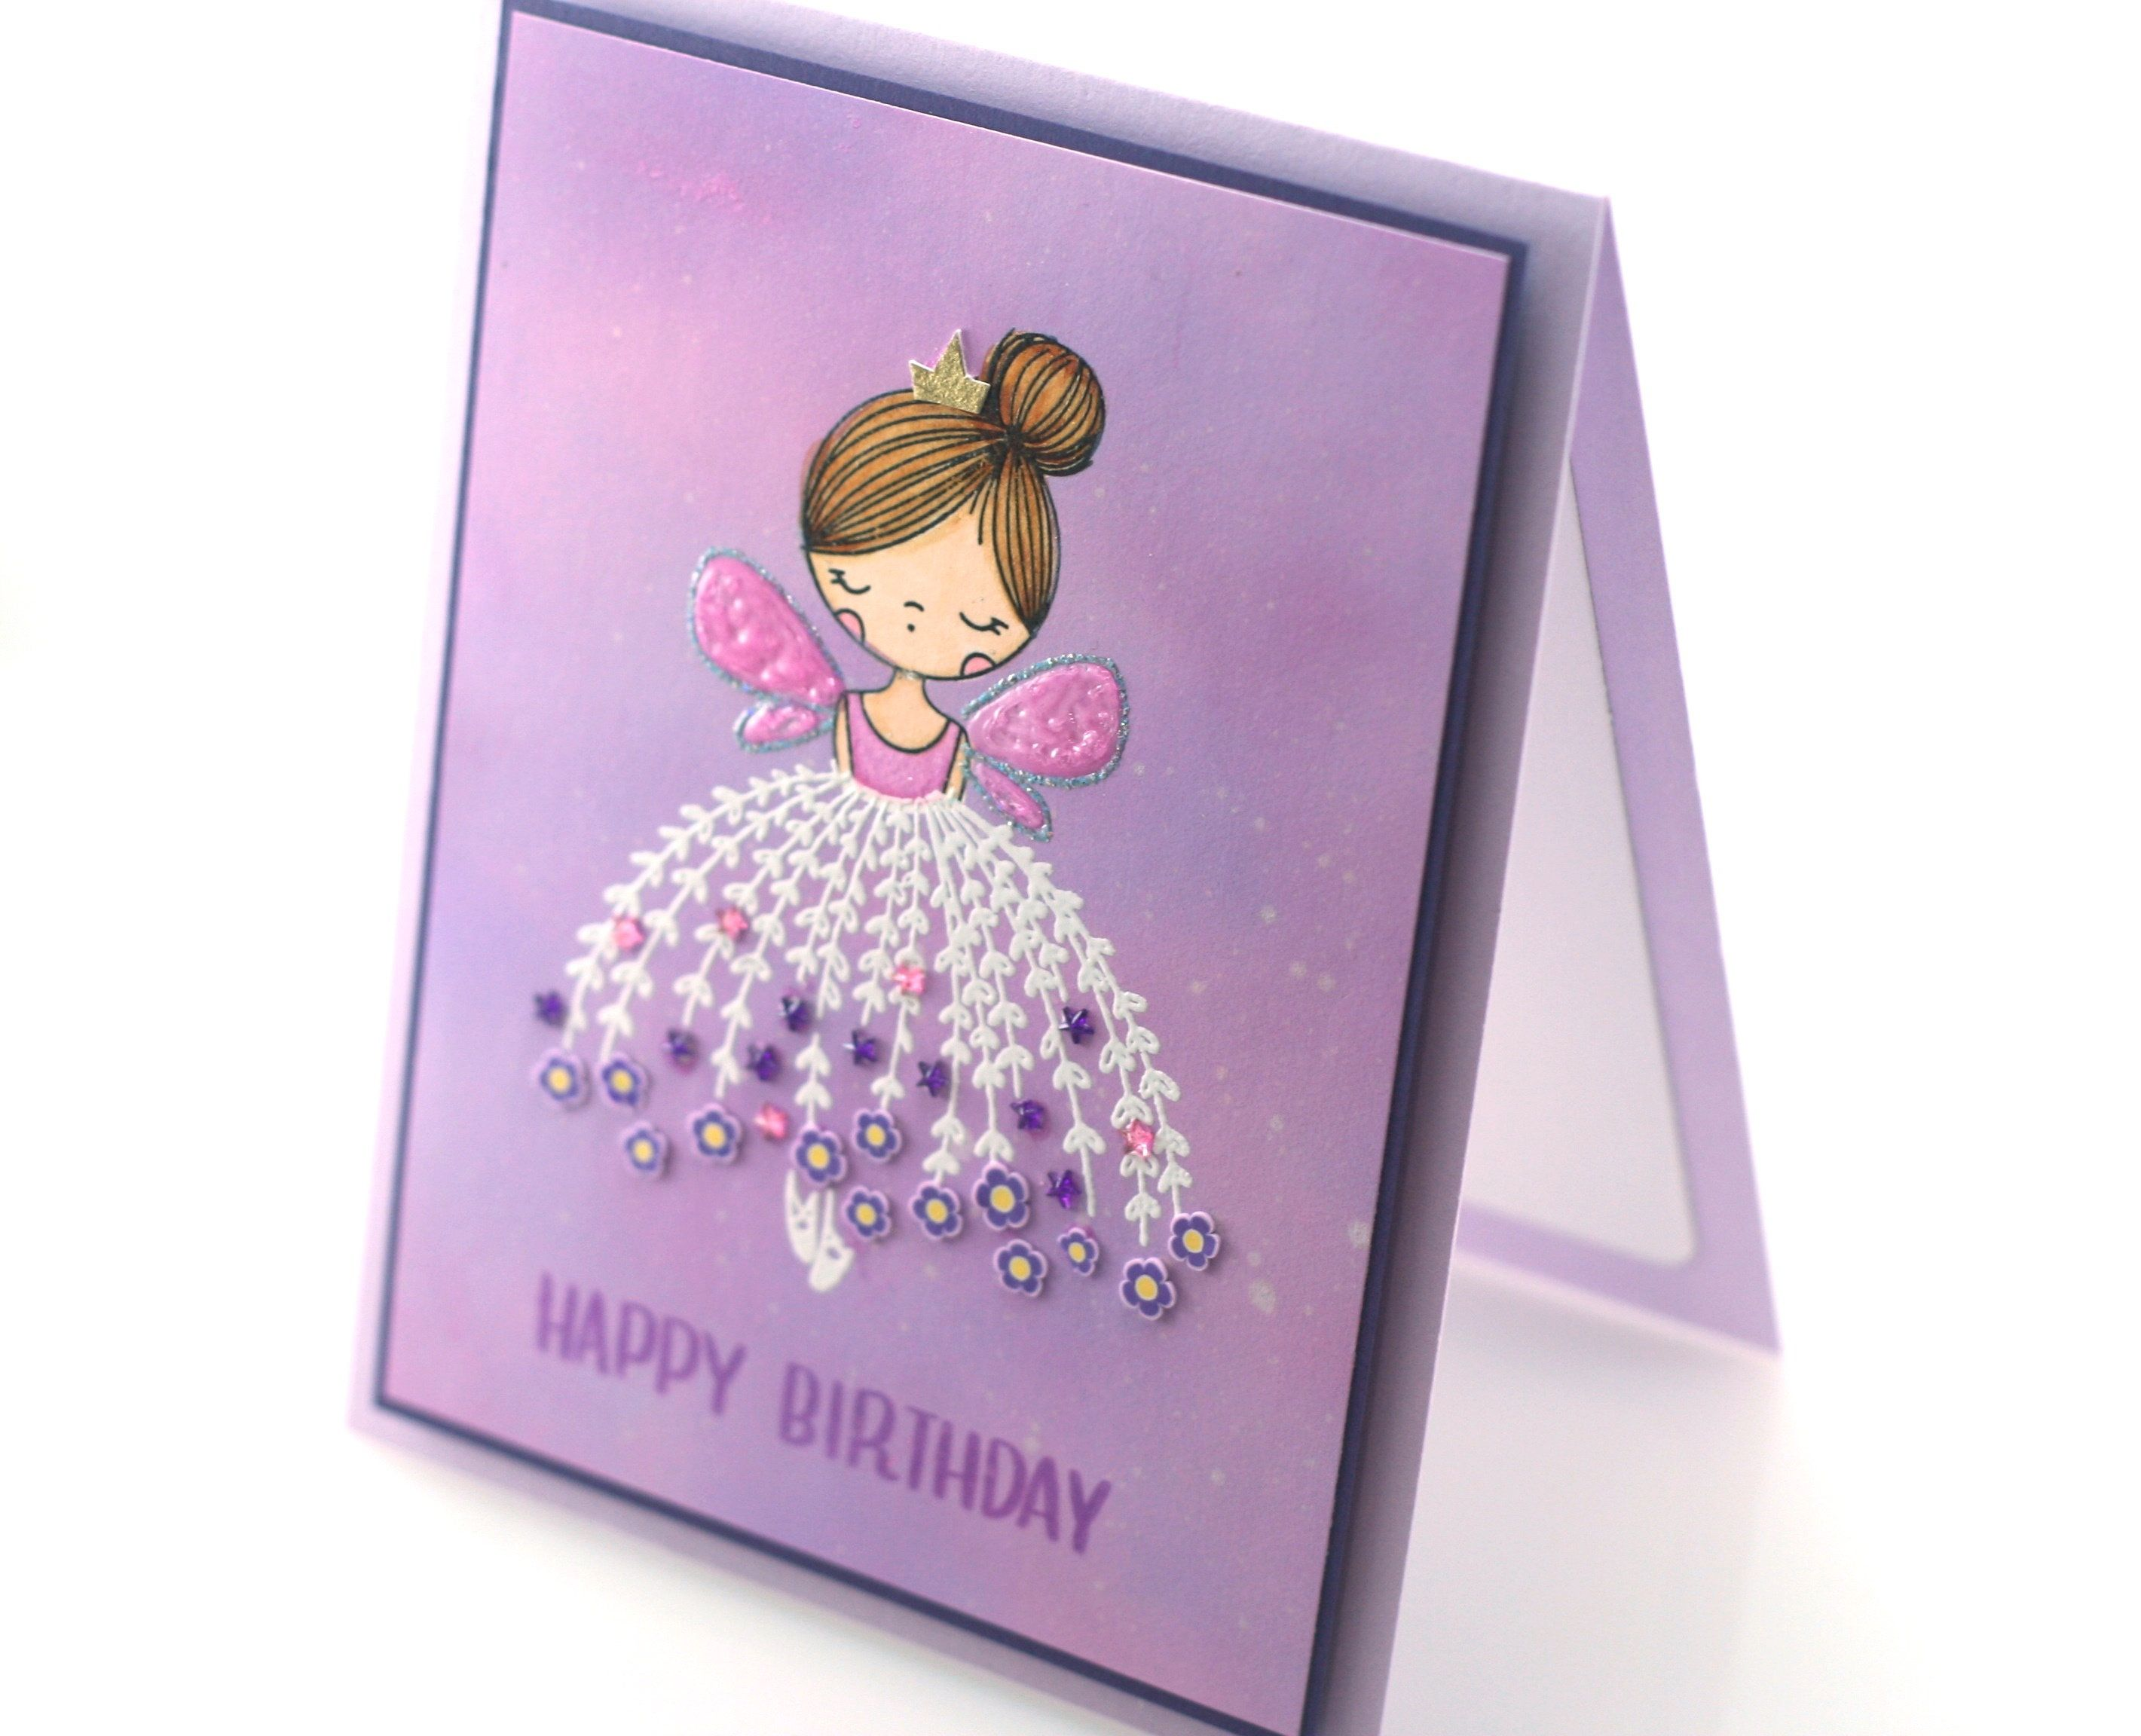 Ballerina Birthday Card Angel Flower Girl Happy Birthday Etsy Birthday Cards Happy Birthday Cards Cards Handmade